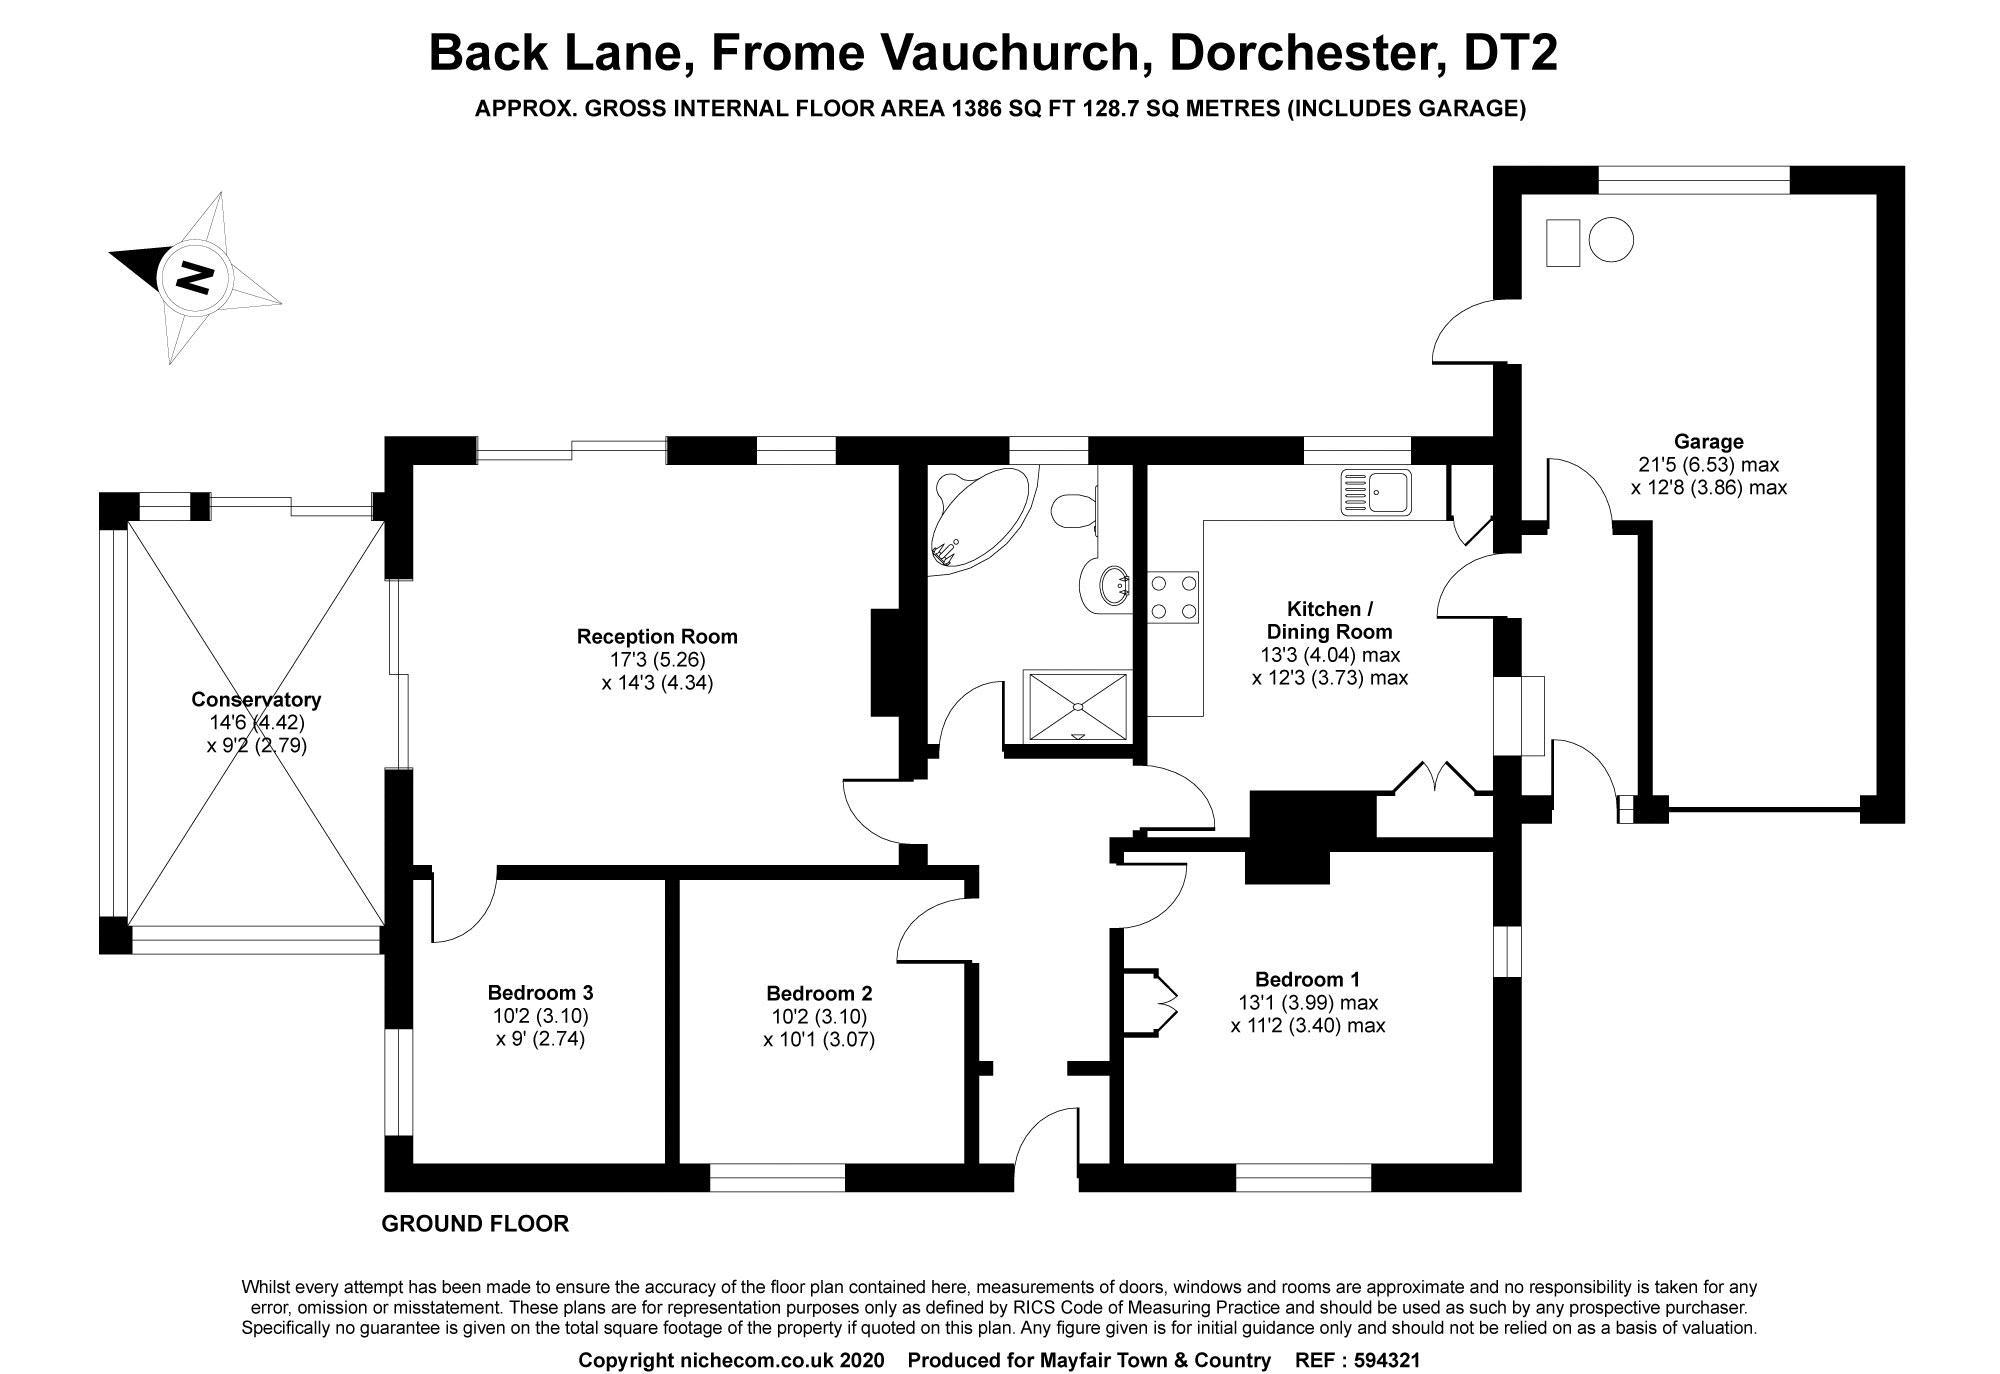 Back Lane Frome Vauchurch